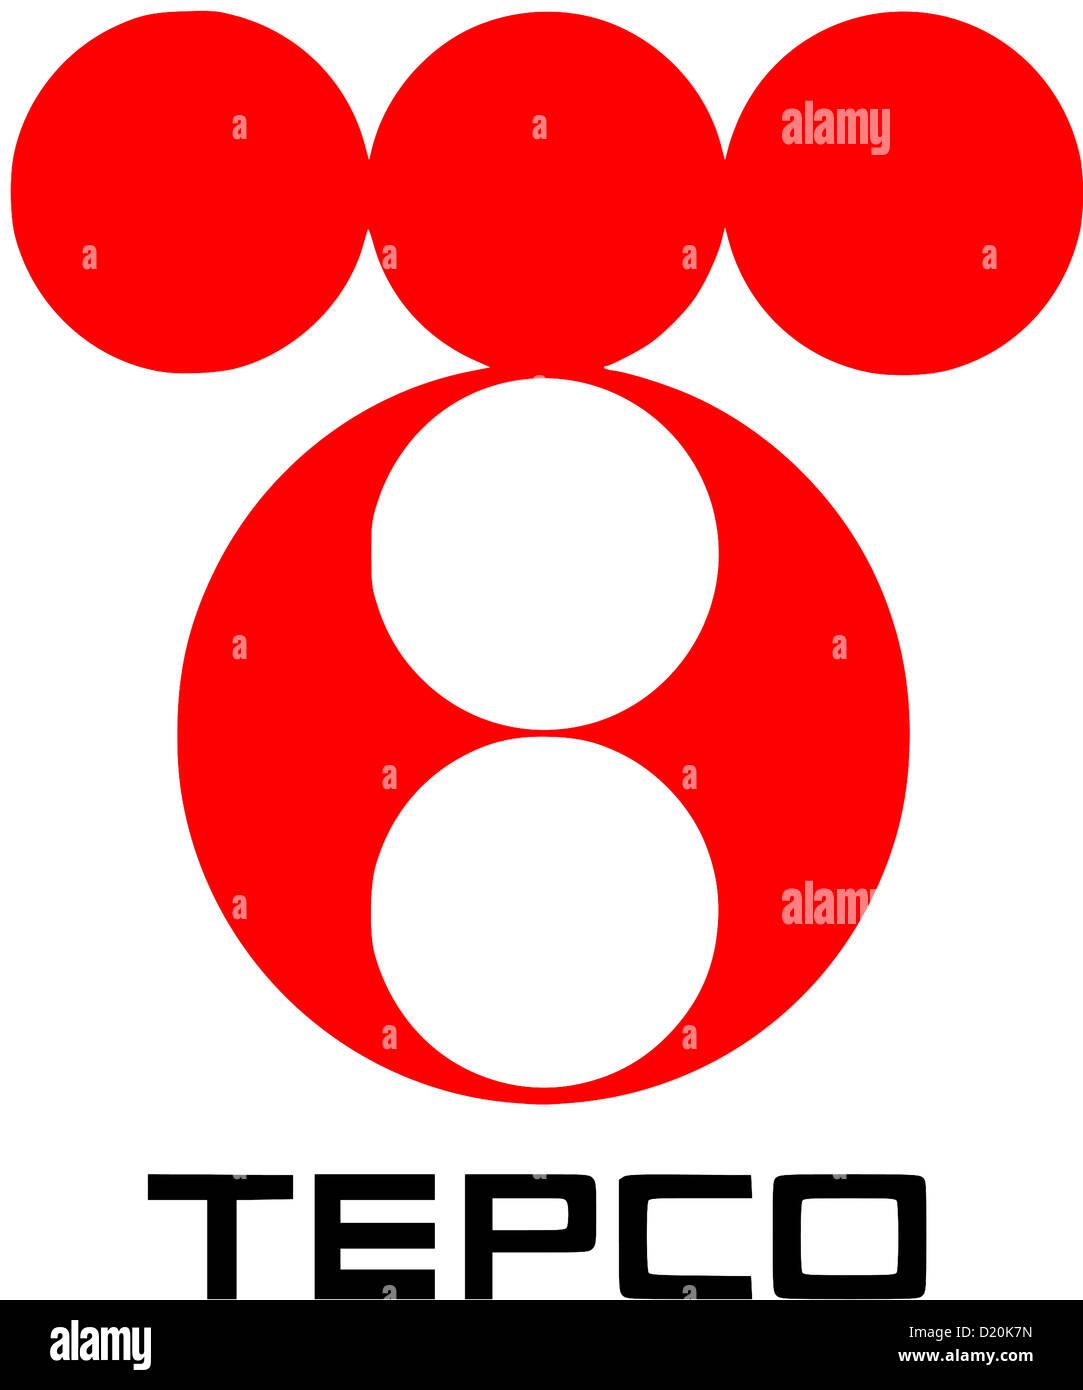 Logo der japanische Energiekonzern Tepco - Tokyo Electric Power Company Incorporated. Stockbild